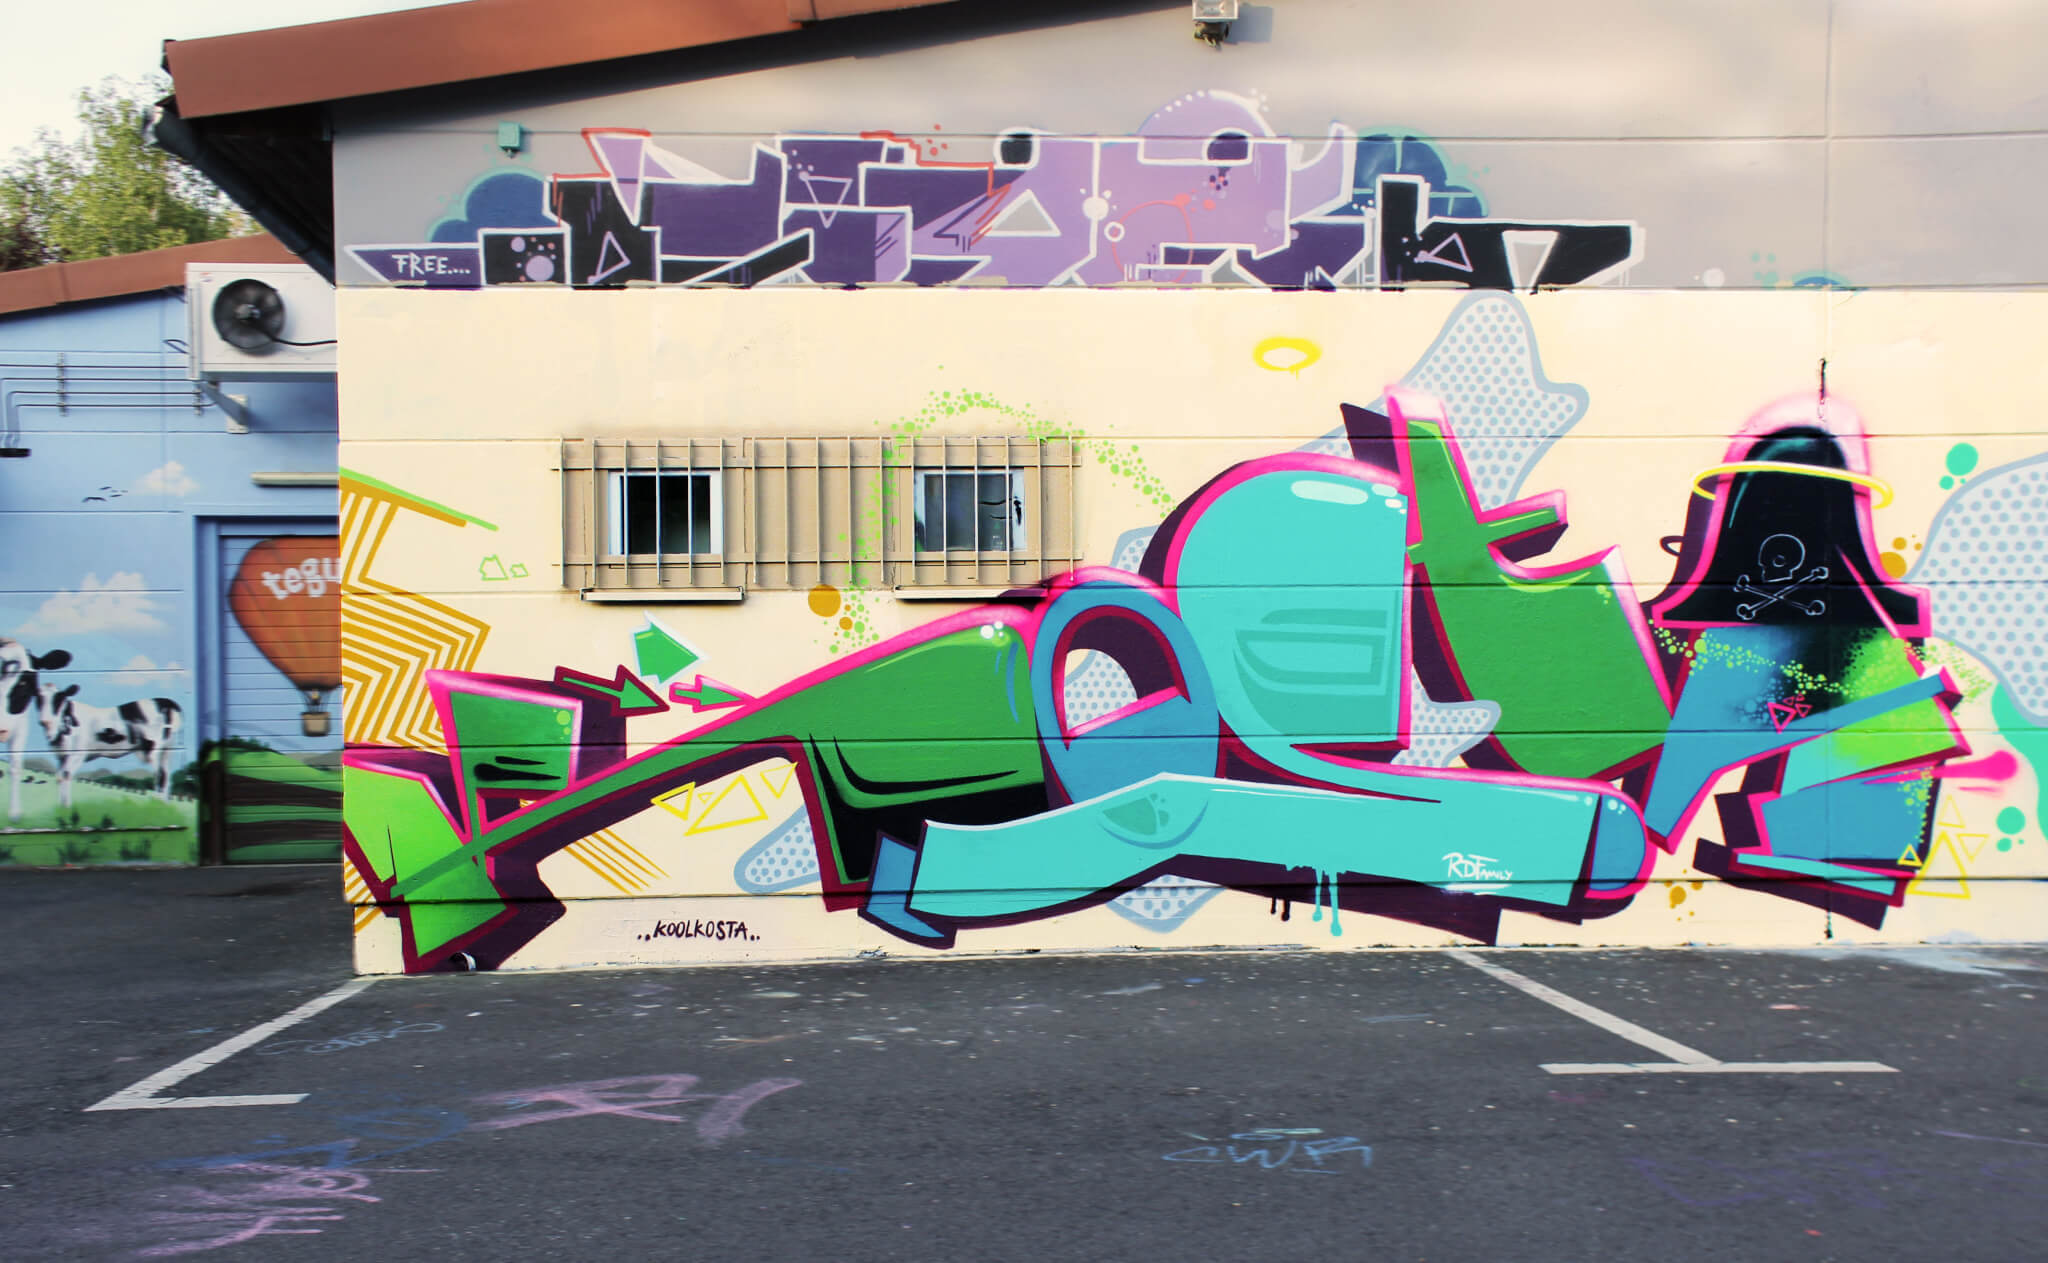 Kosta Graffiti in Bad Salzungen 2017